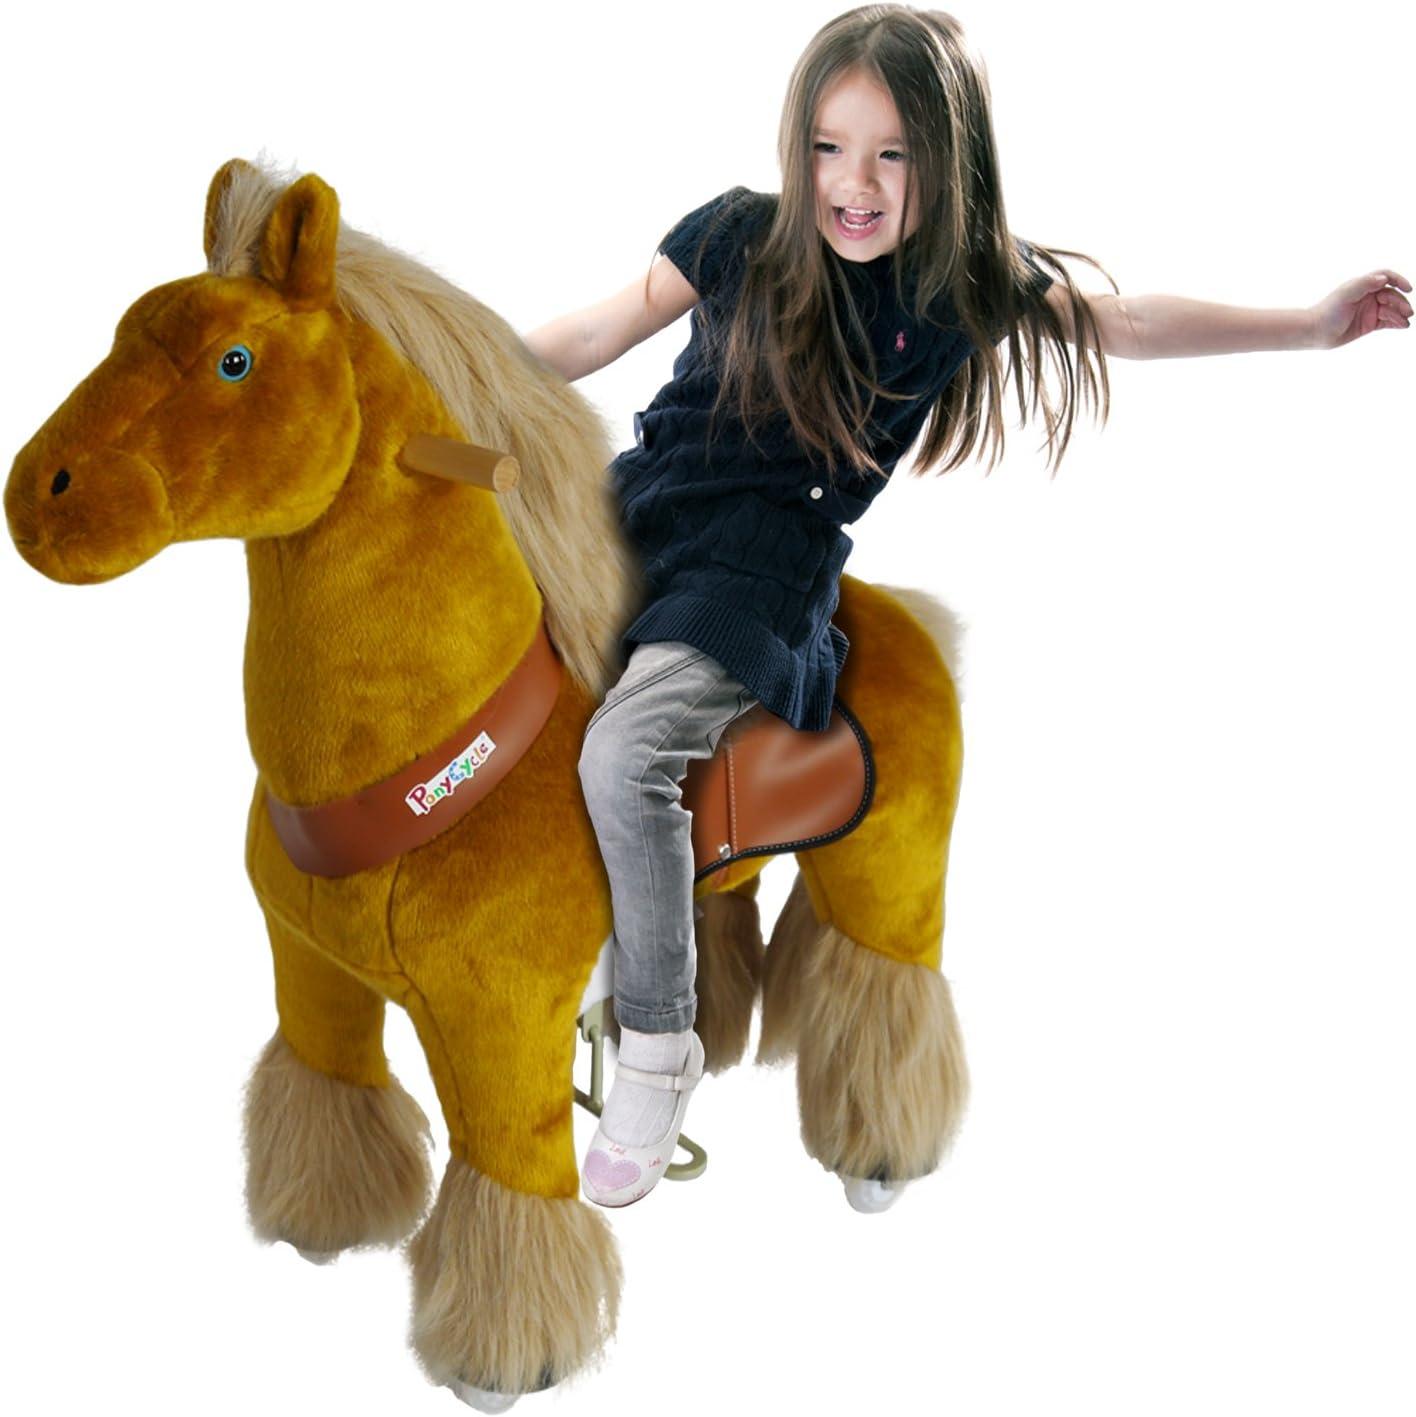 PonyCycle Original Caminar Montar el Pony Mecánico Oficial Caballo Pequeño Royal